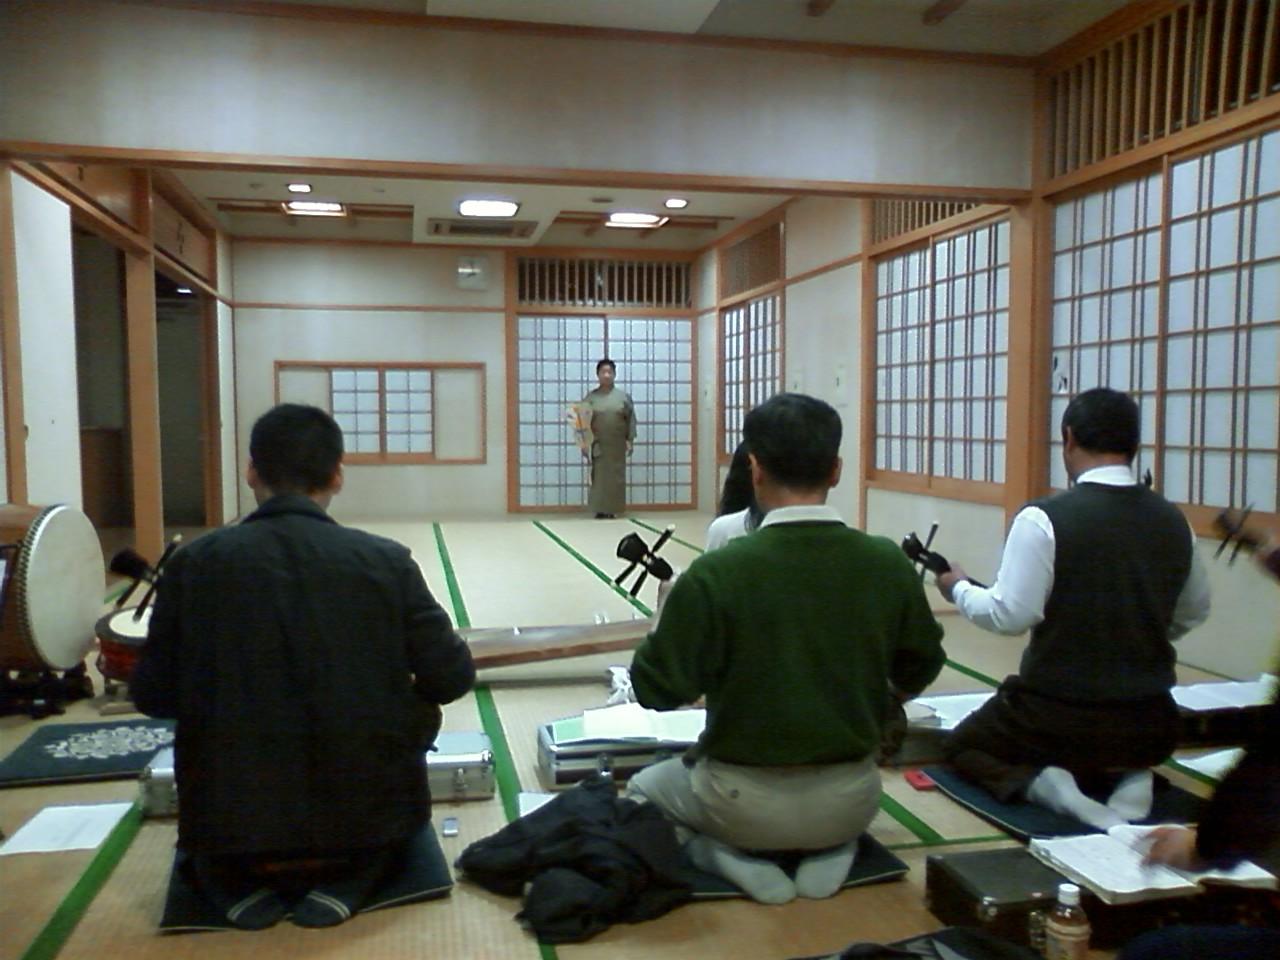 琉球古典音楽への想い ~歌三線、太鼓日記~ 福原敬